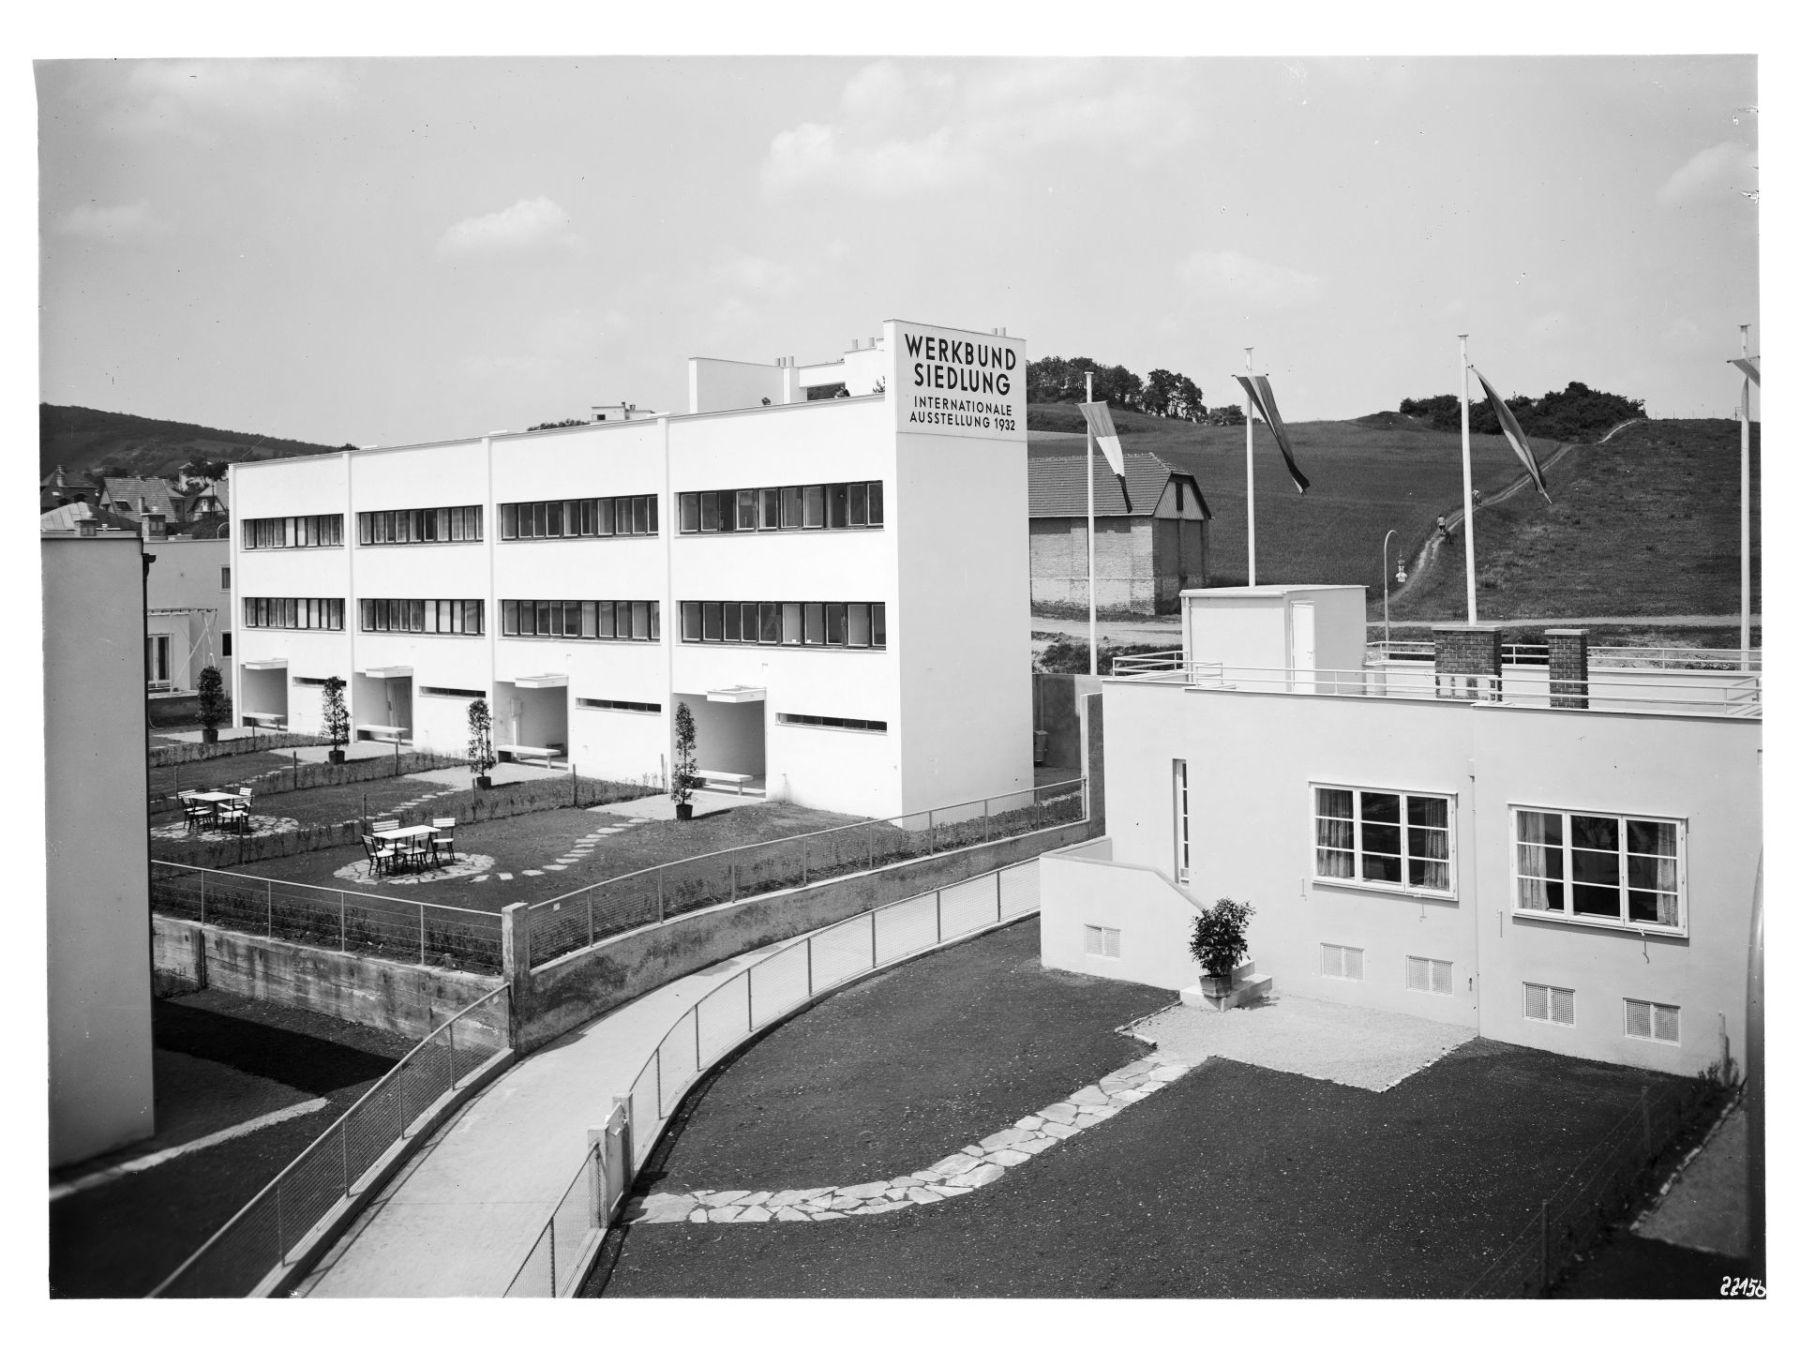 Widok na domy projektu André Lurçat i Josefa Hoffmanna, 1932 © Architekturzentrum Wien, Sammlung, Zdjęcie: Julius Scherb (źródło: materiały prasowe organizatora)